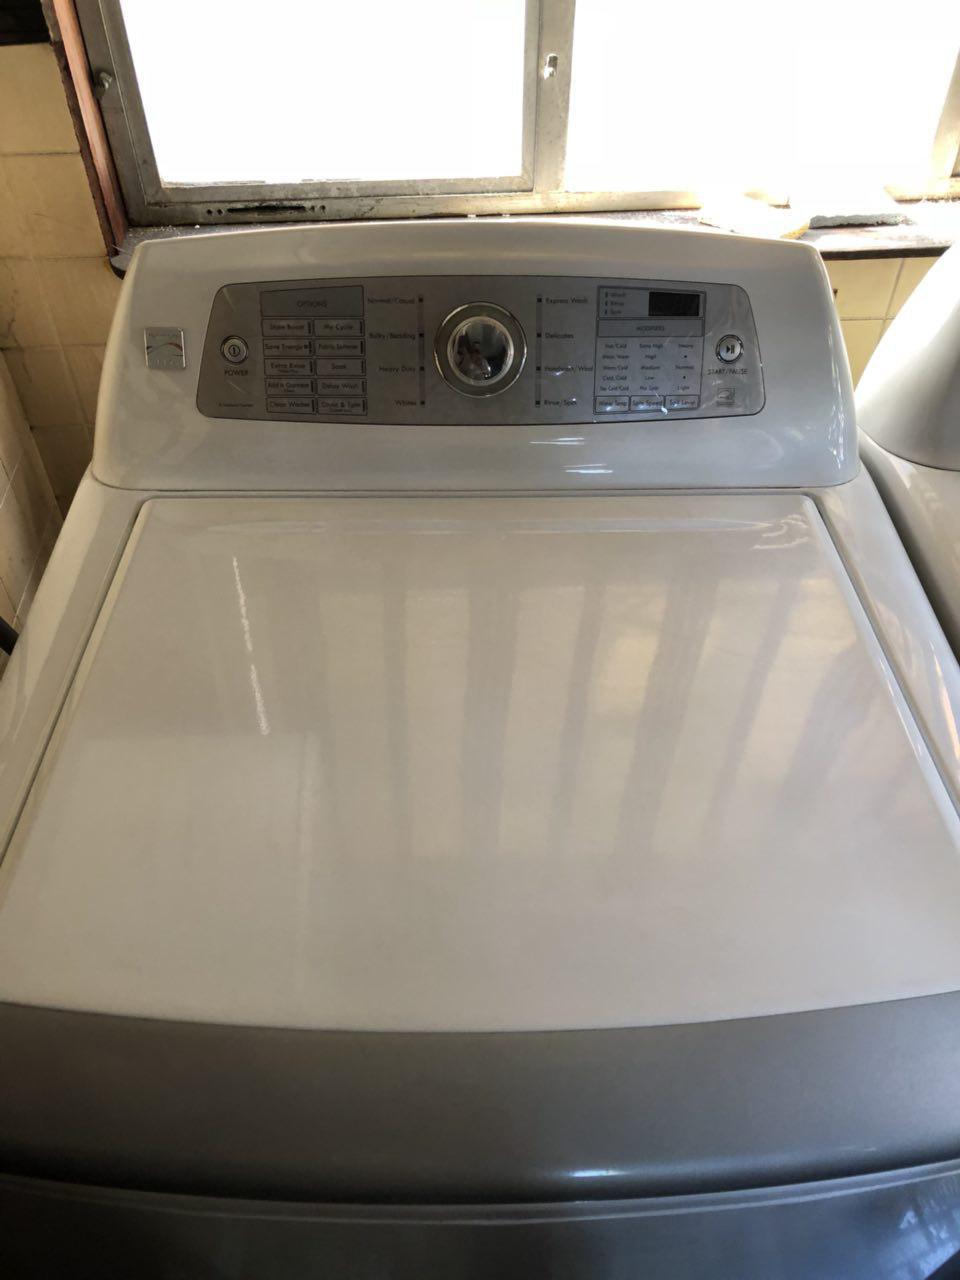 Kenmore Elite Washer Model 796 29002000 Service Manual